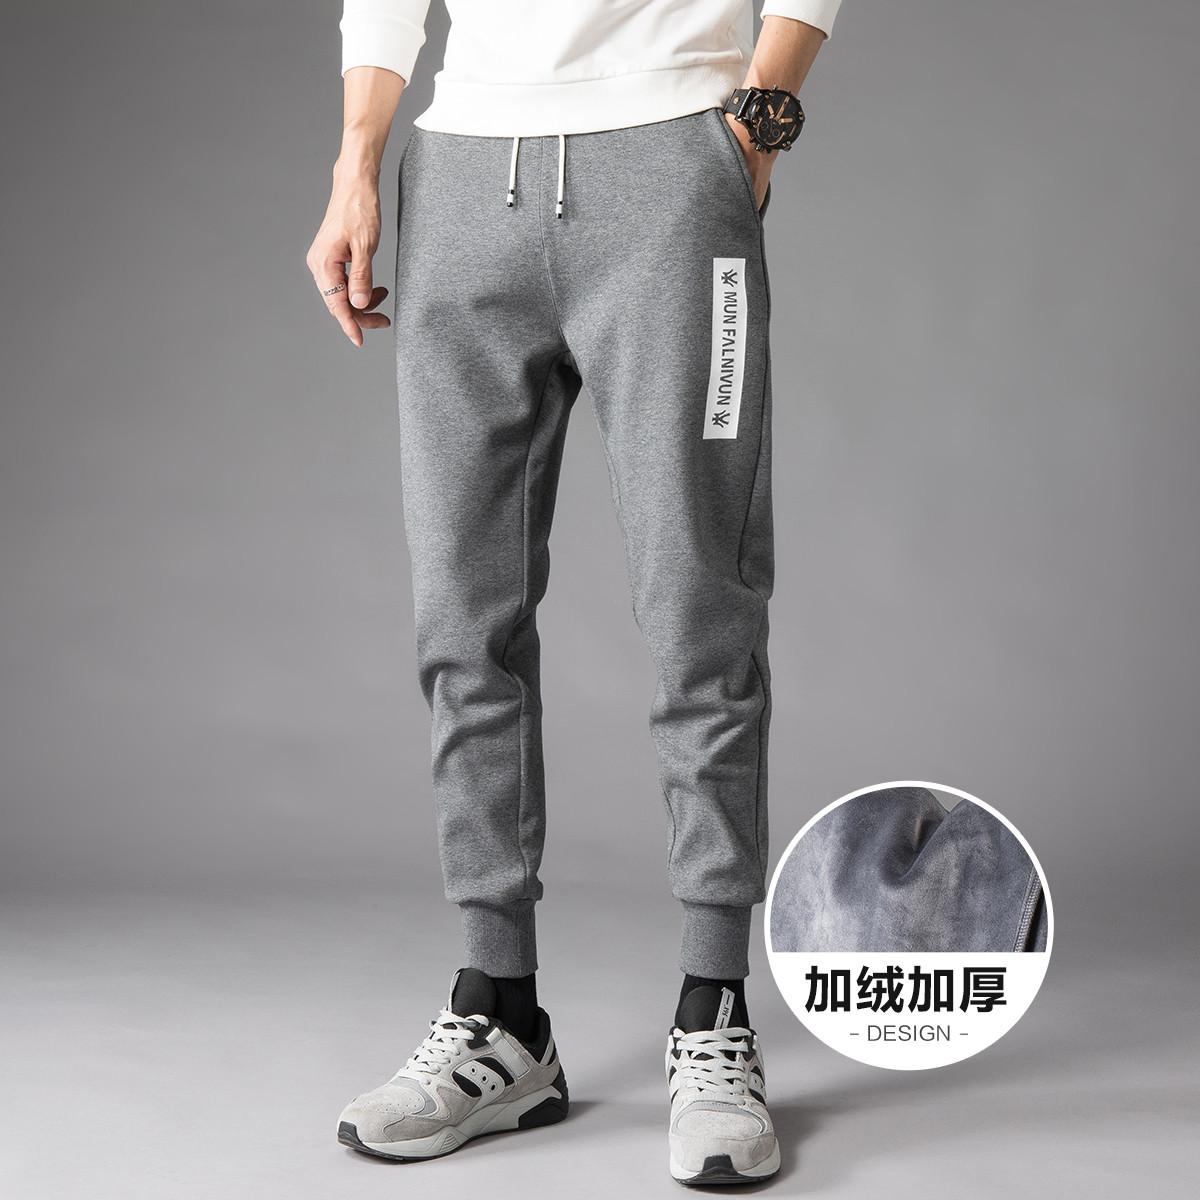 RAMPAGE冬装新品加绒加厚男款运动裤时尚休闲保暖百搭男式长裤RQ221707